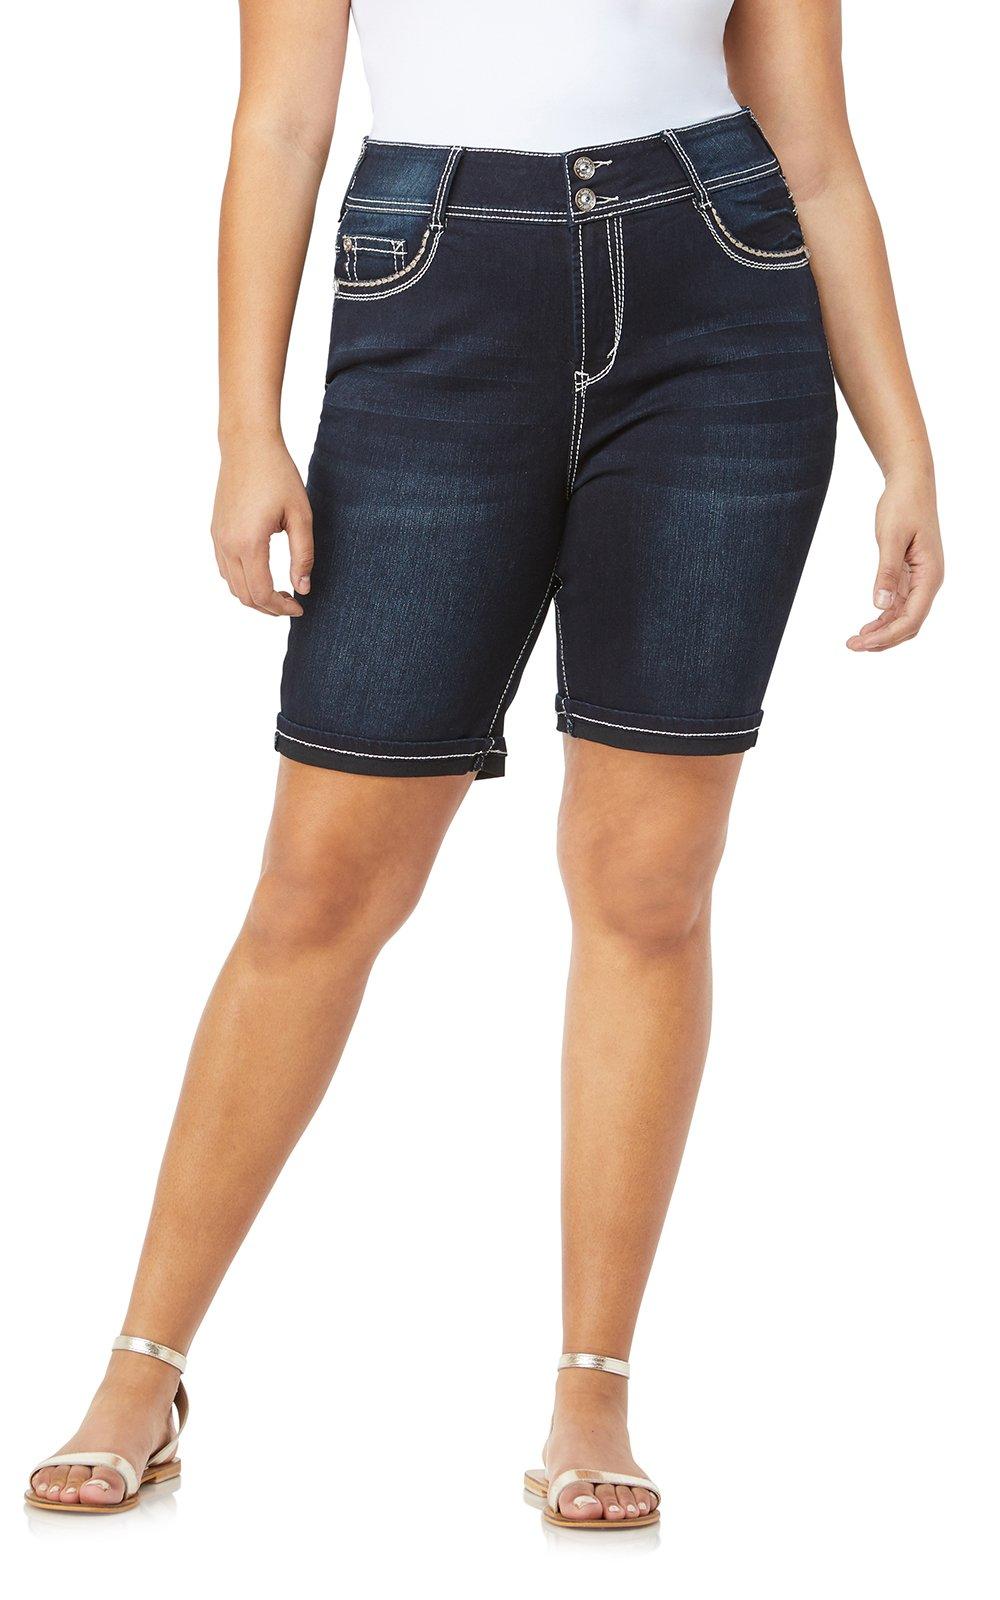 WallFlower Women's Juniors Plus-Size Luscious Curvy Embellished Bermuda Shorts in Kaylee, 18 Plus